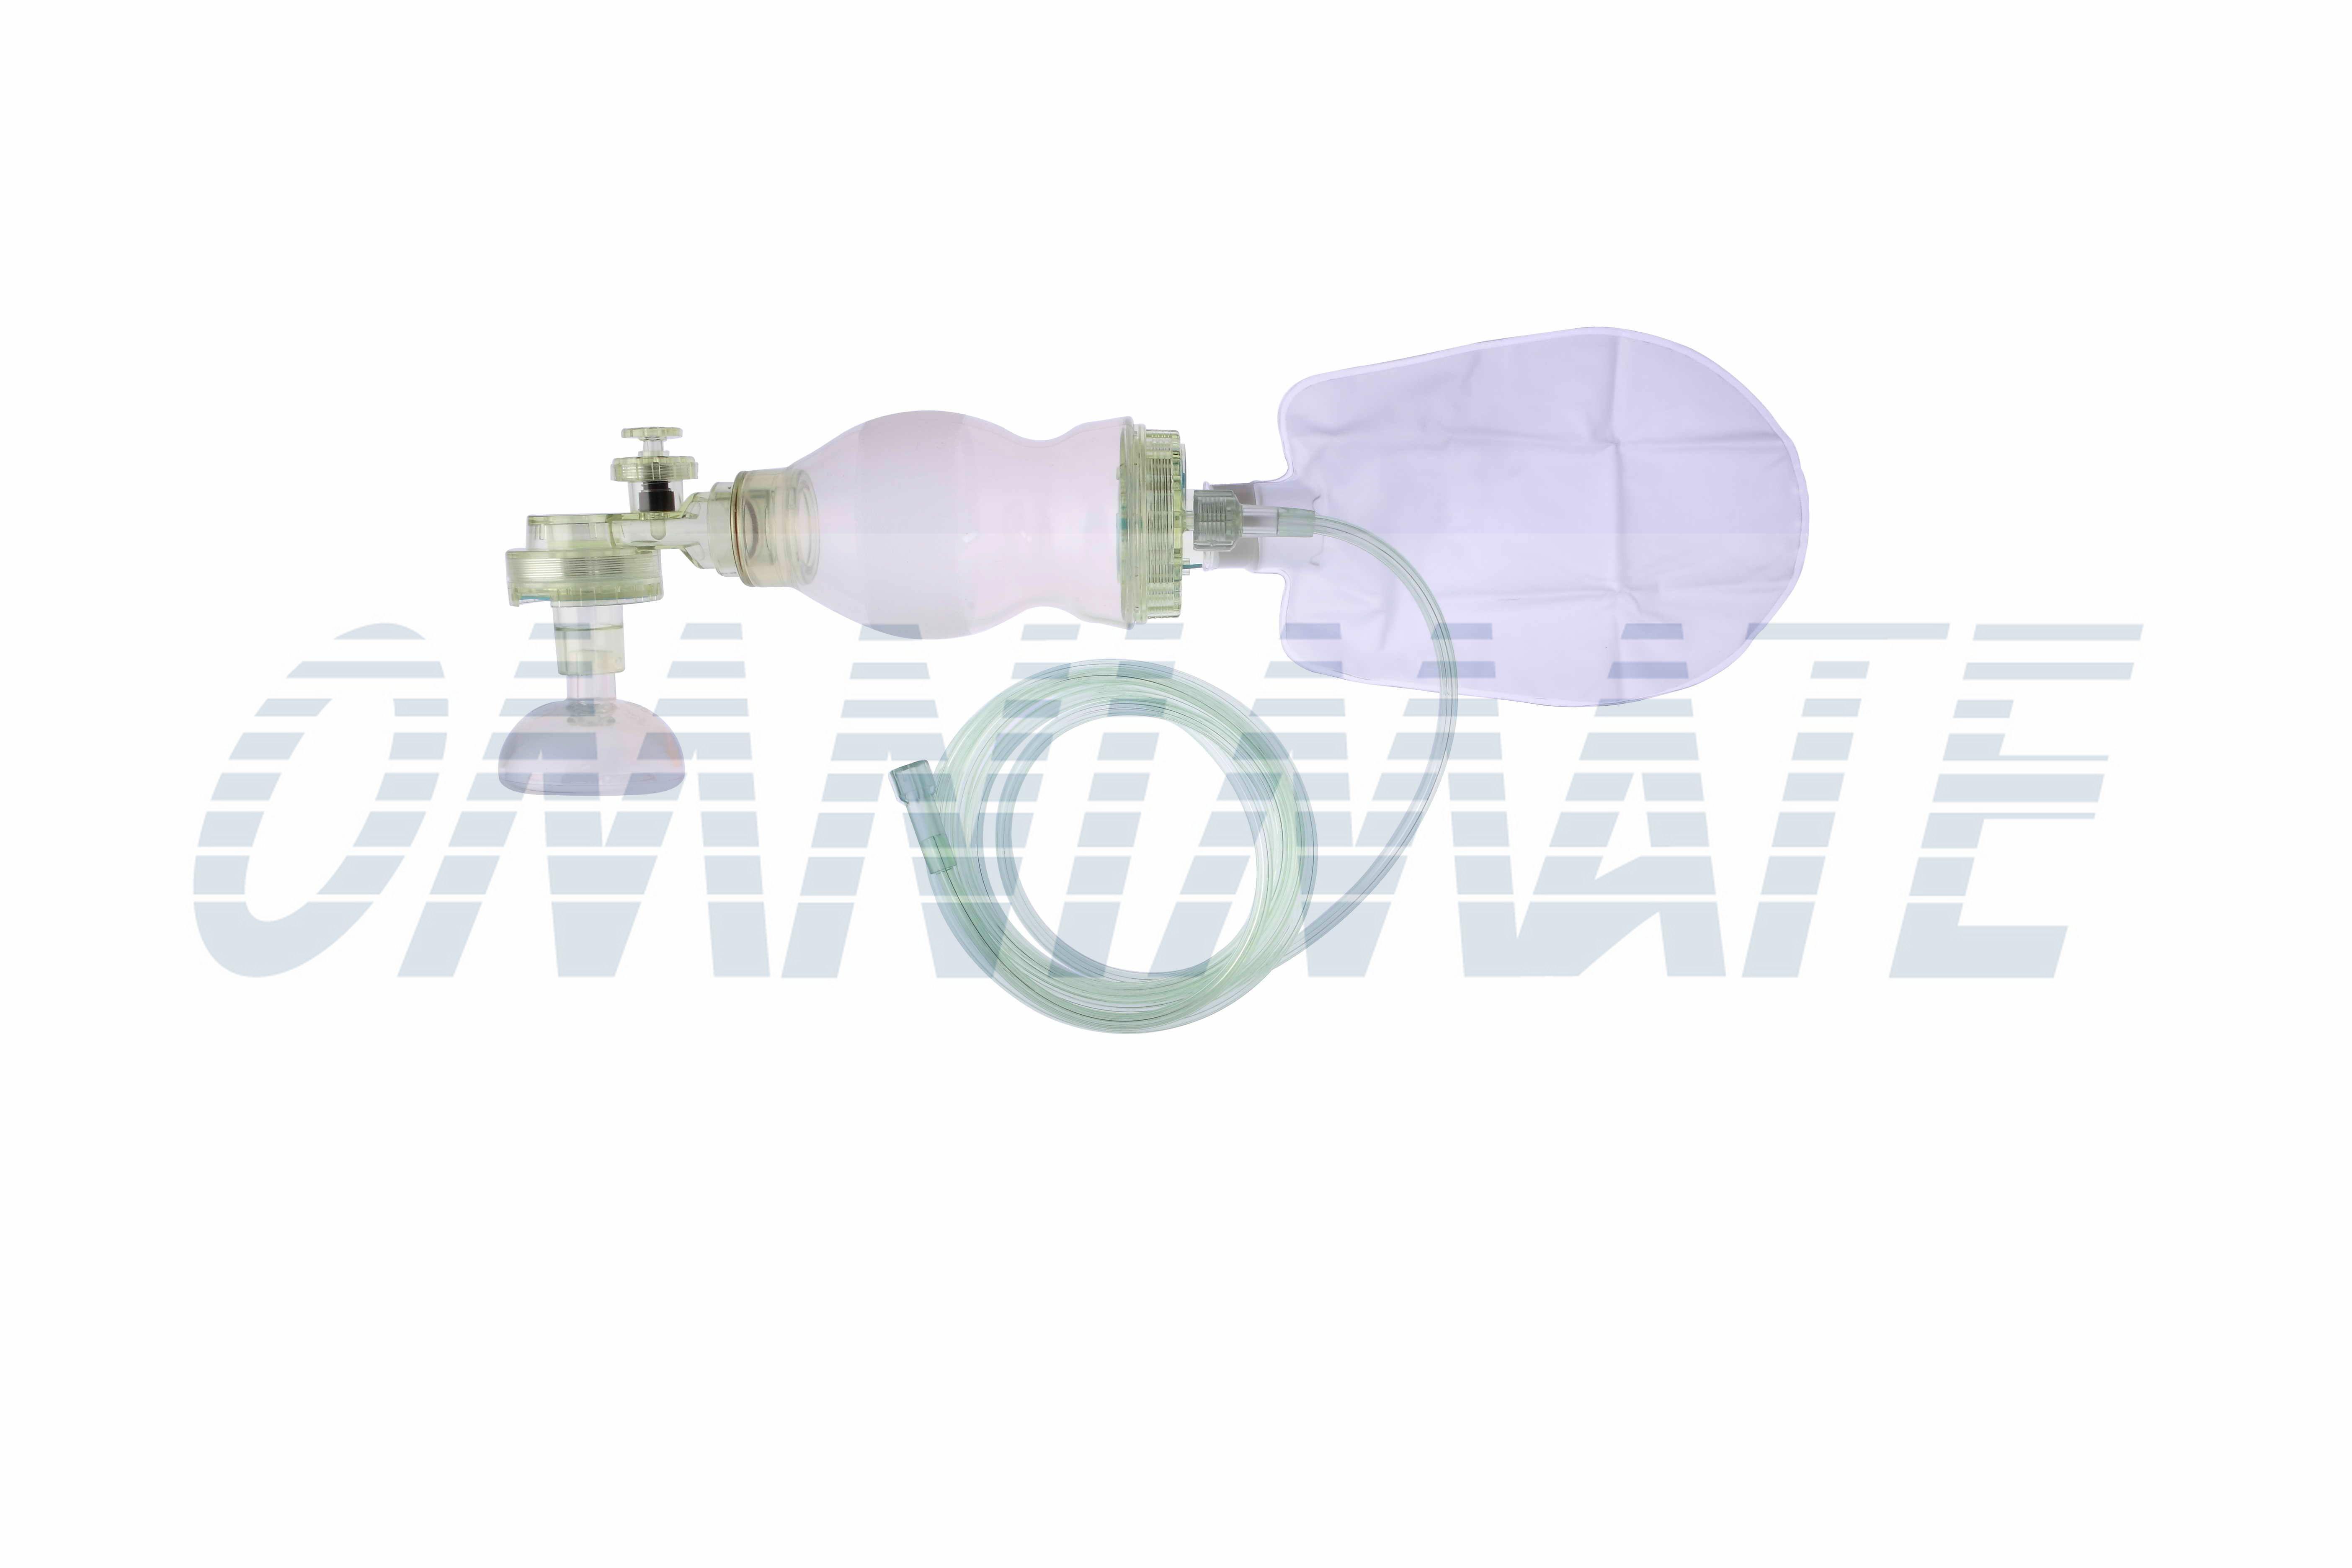 Ressuscitador de Silicone Infantil Reutilizável + Máscara de Almofada de Ar # 1 - 300ml